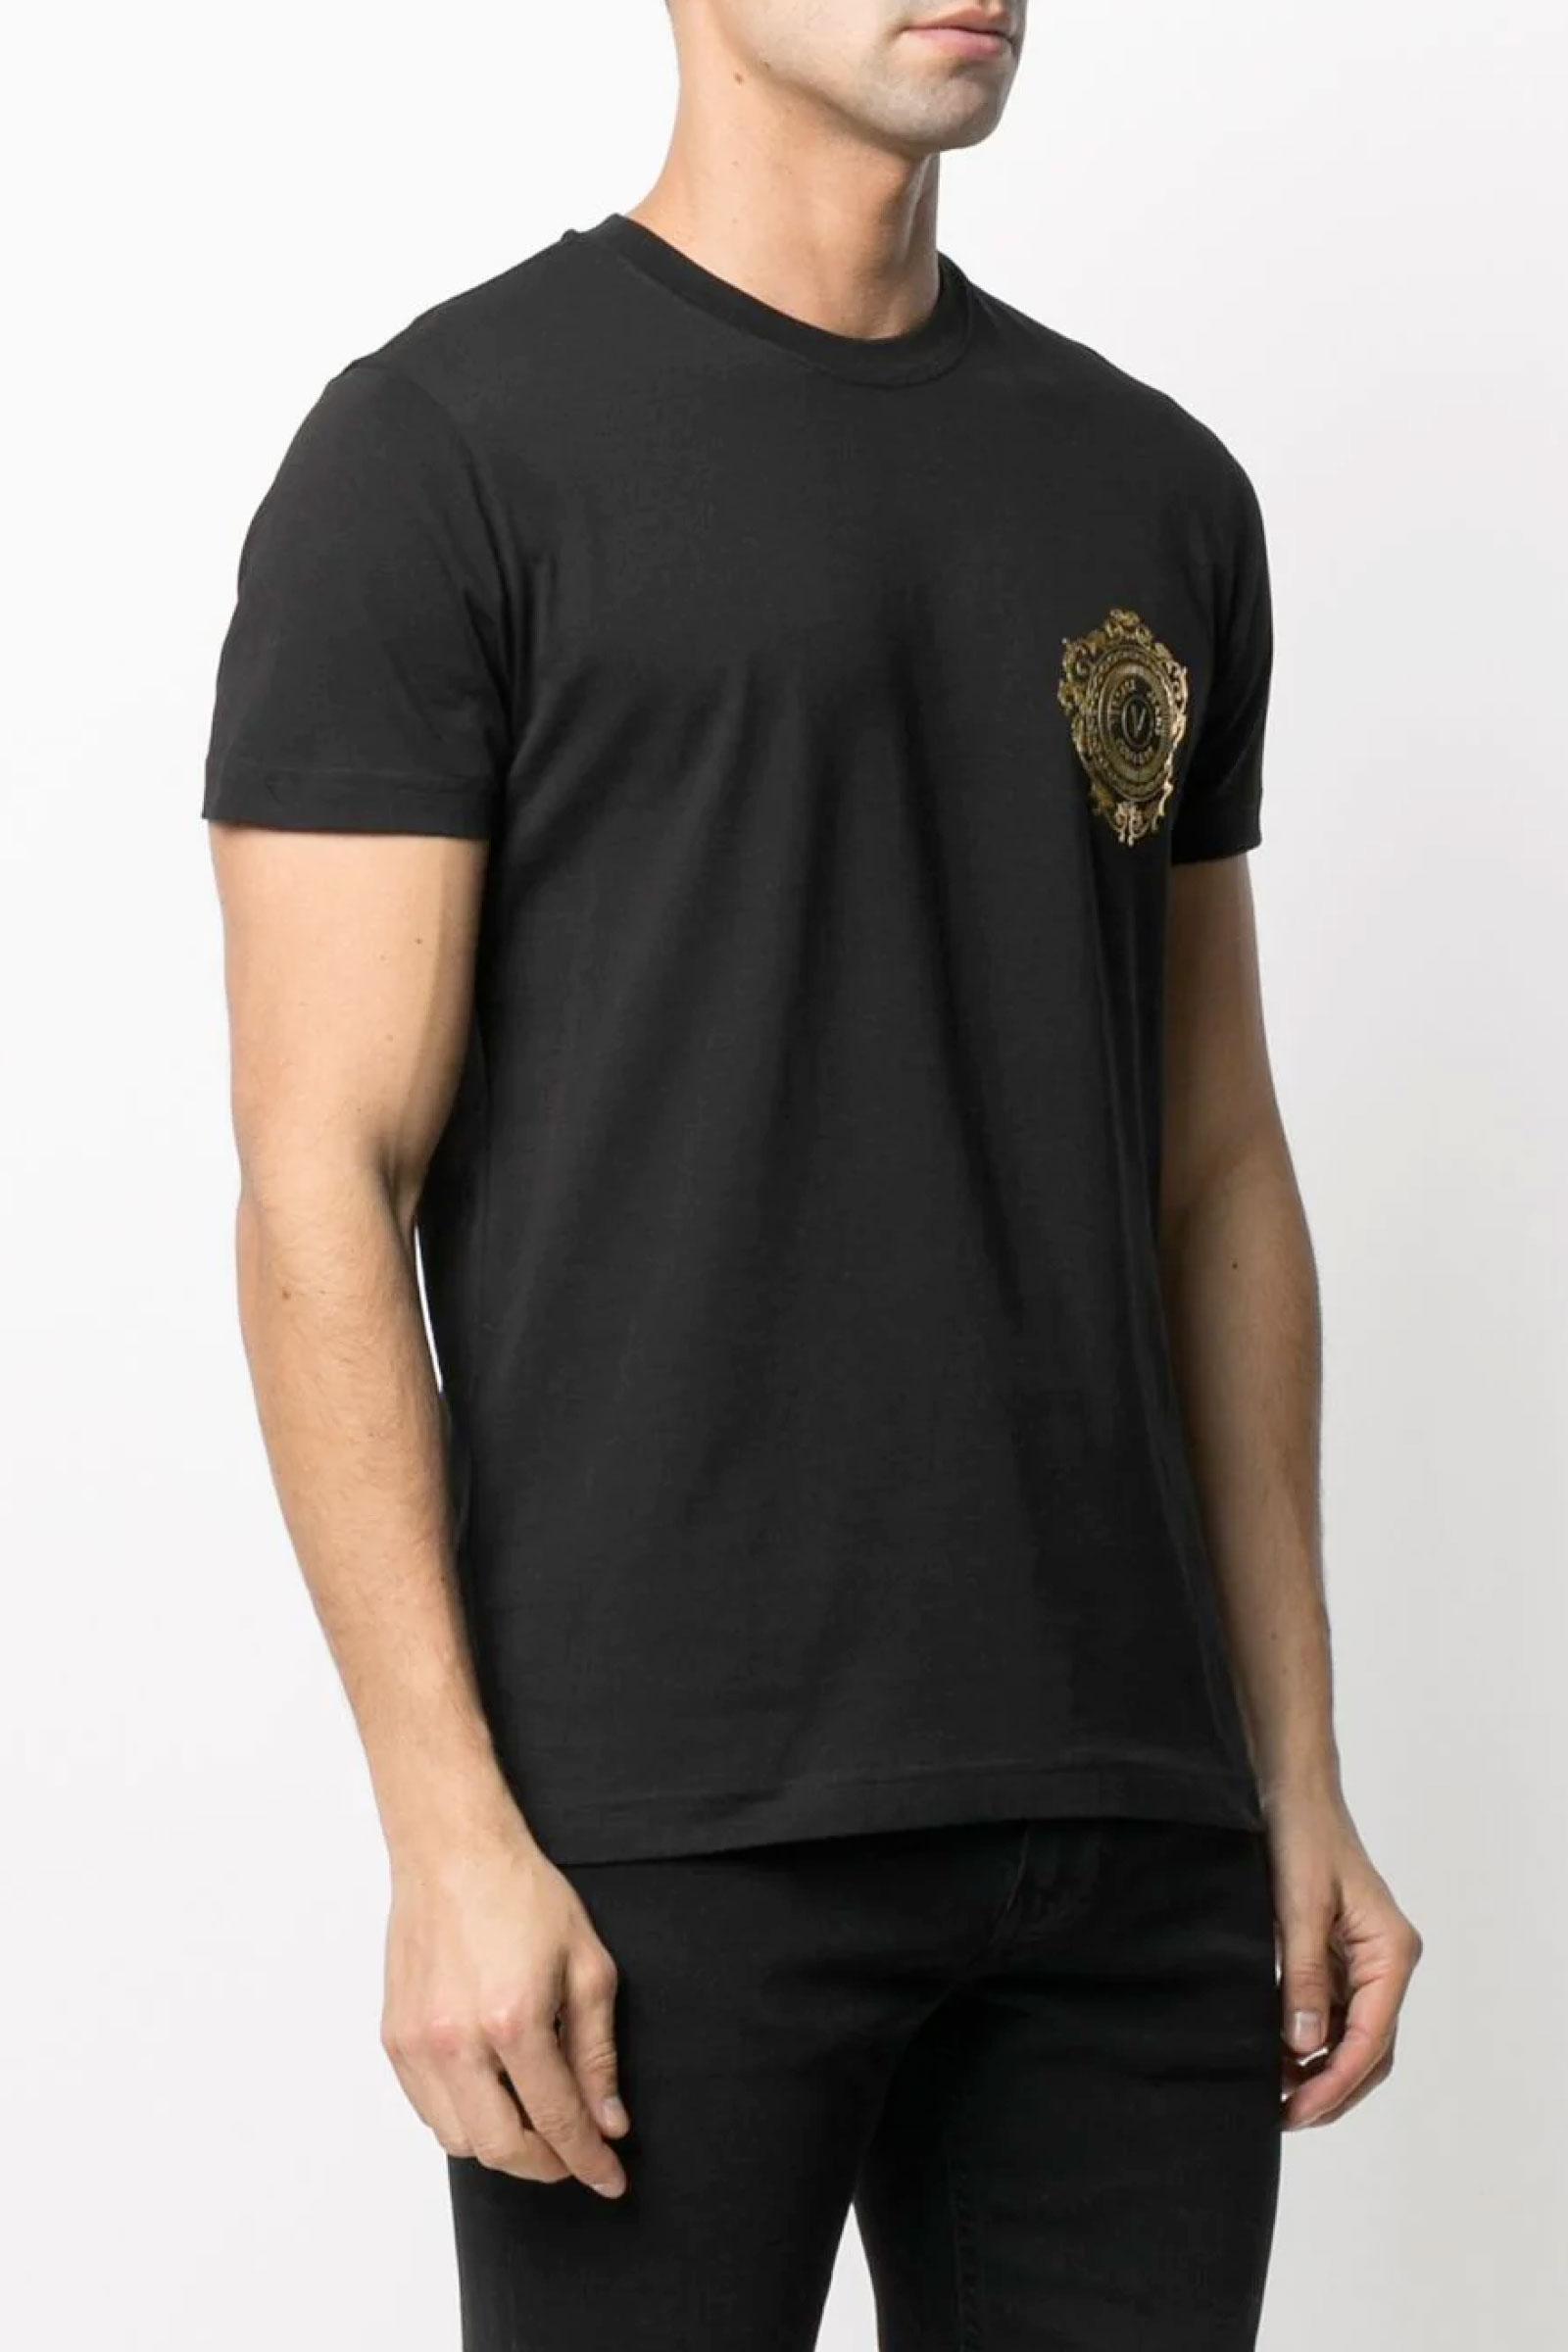 VERSACE JEANS COUTURE Men's T-Shirt VERSACE JEANS COUTURE | T-Shirt | B3GWA71F30454K42